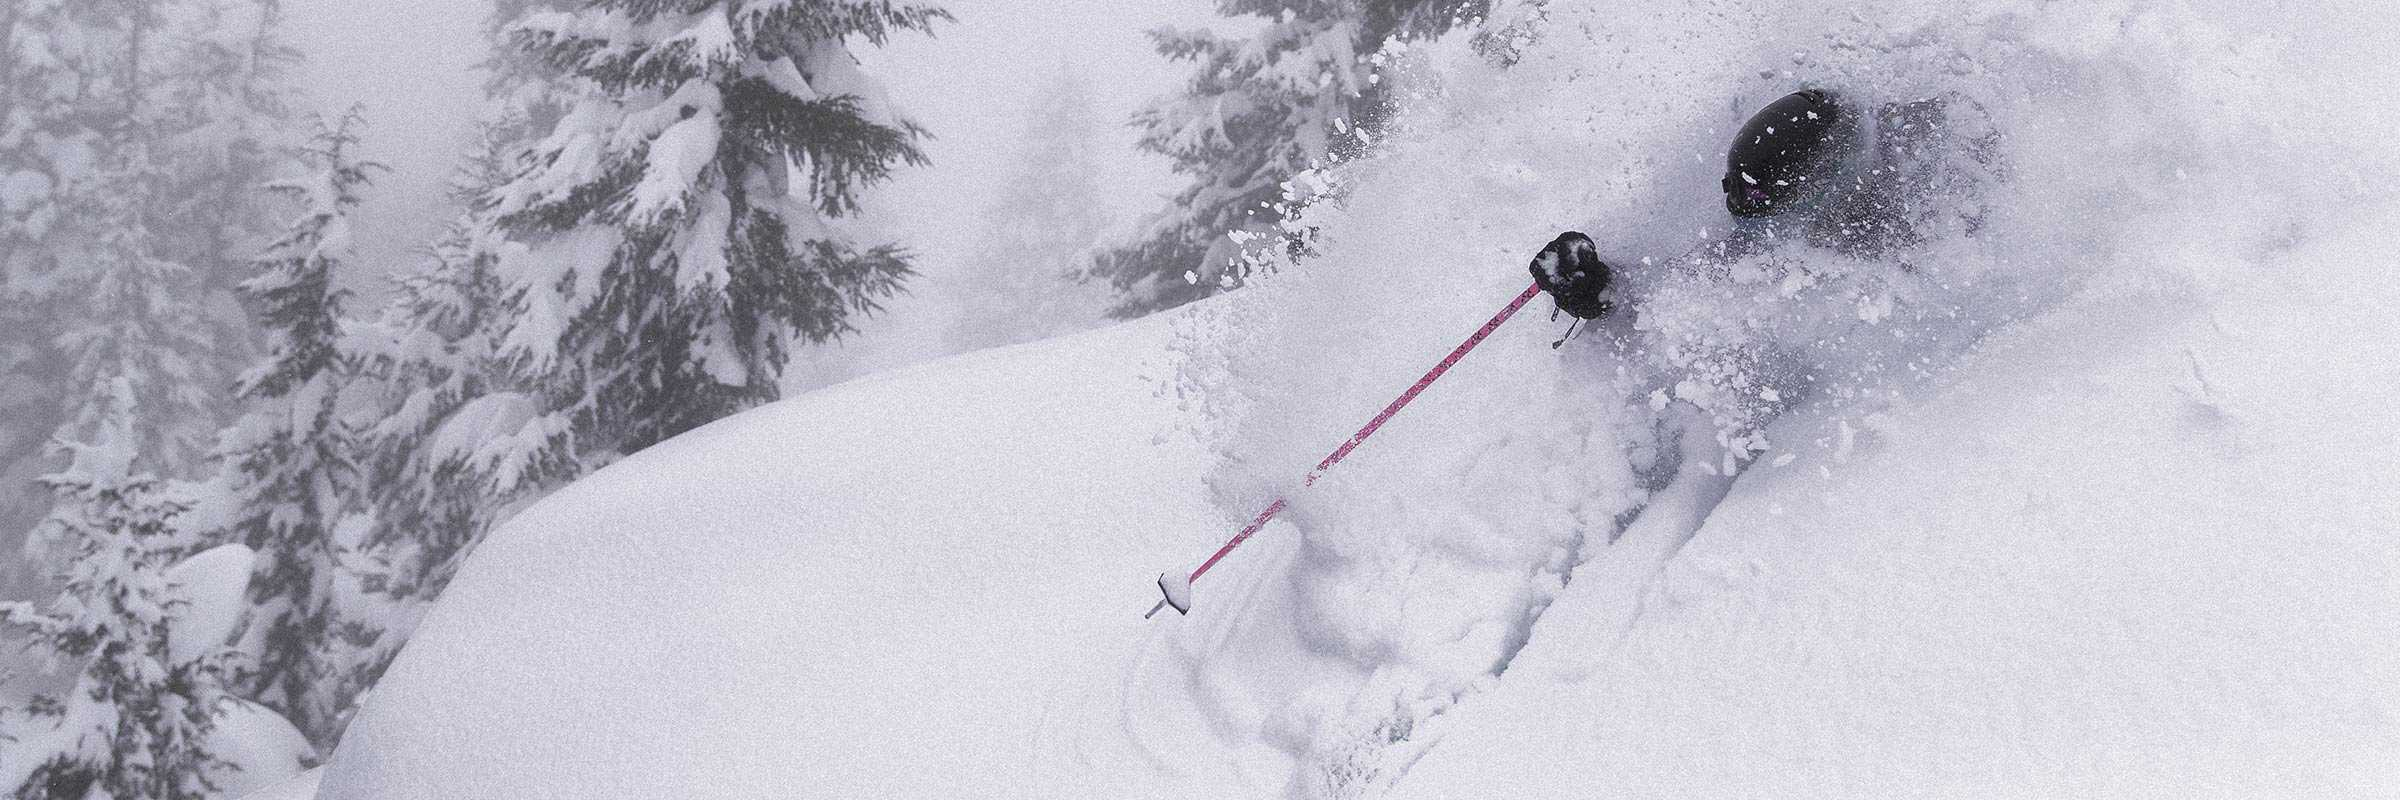 Arc'teryx, Ski & Snowboard. Arc'teryx Women's Ski & Snowboard Jackets for Winter 2018